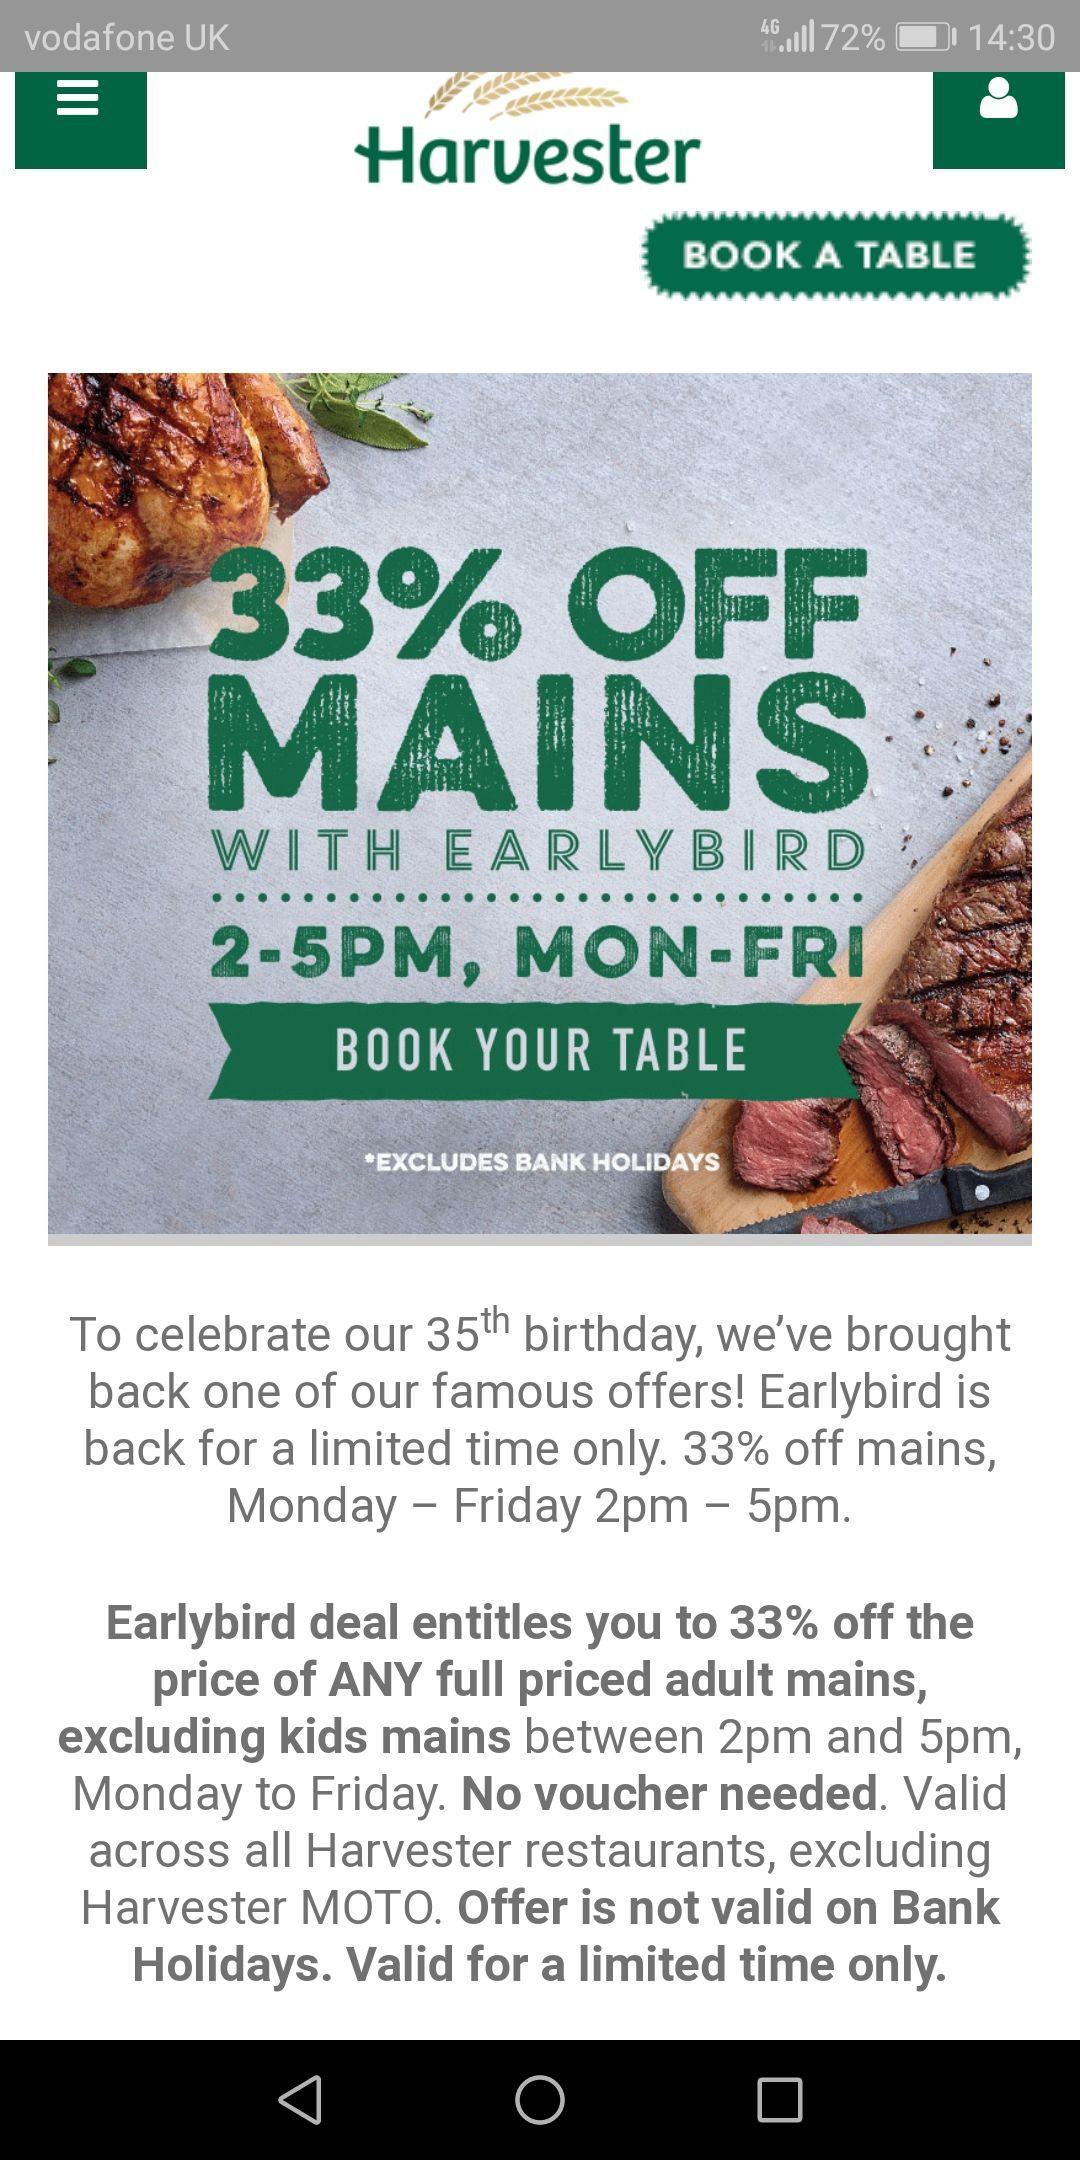 Harvester pub 33% off adult mains Mon - Fri 2pm-5pm